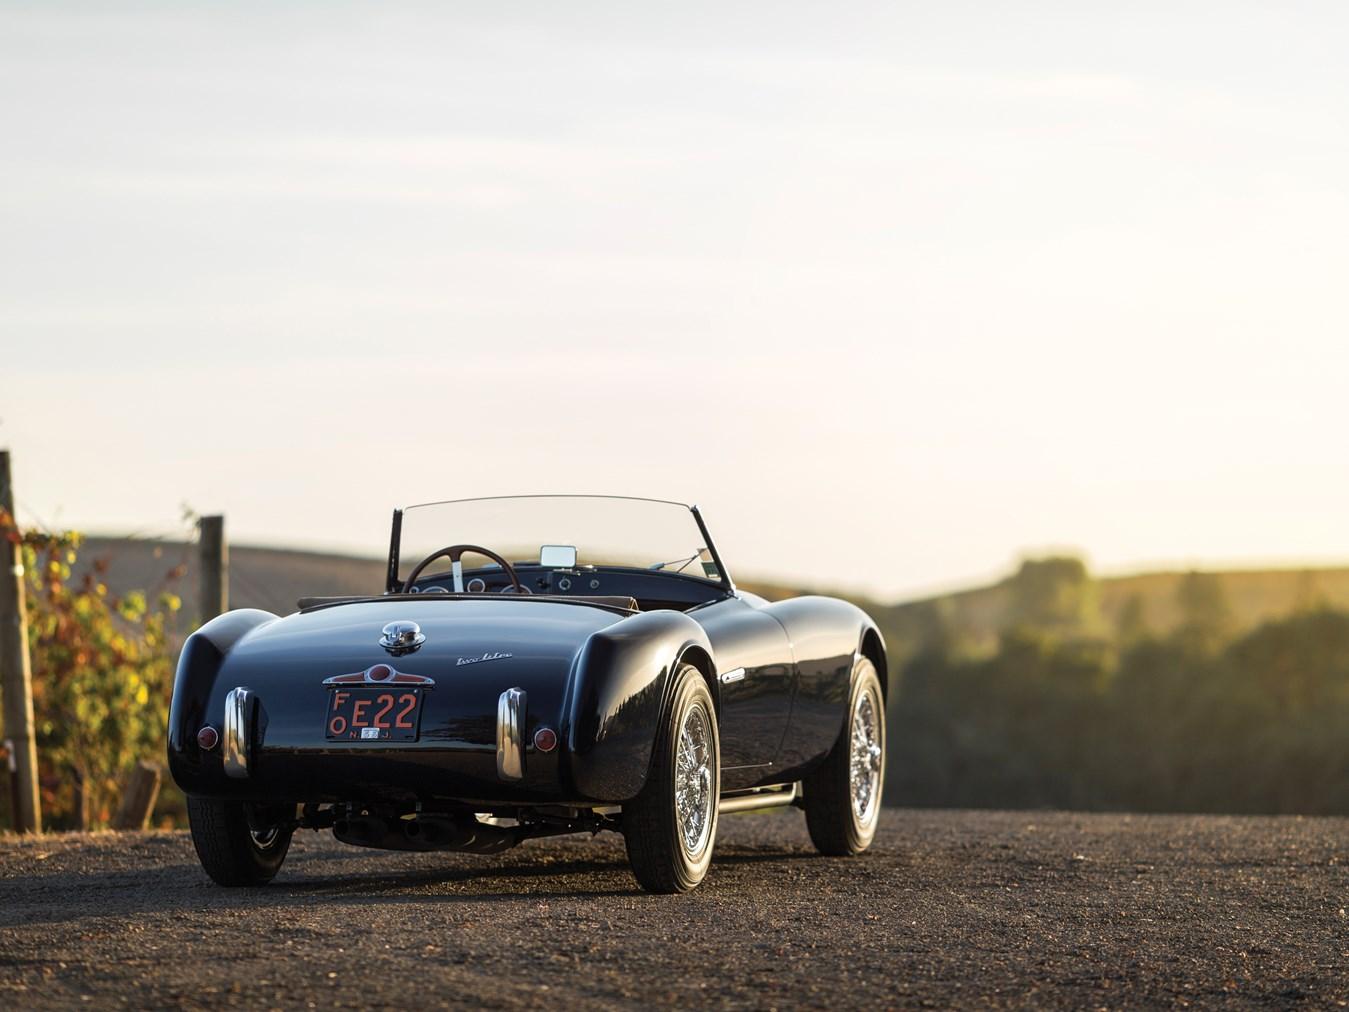 1954 Siata 208S Spider by Motto